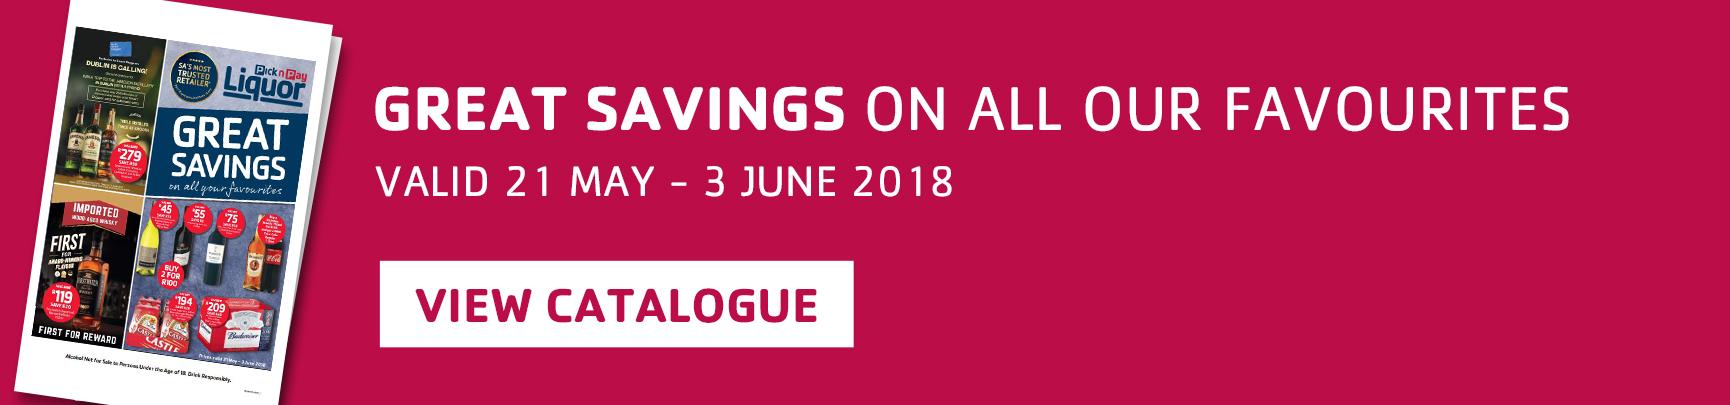 great_savings_on_all_favourites.jpg